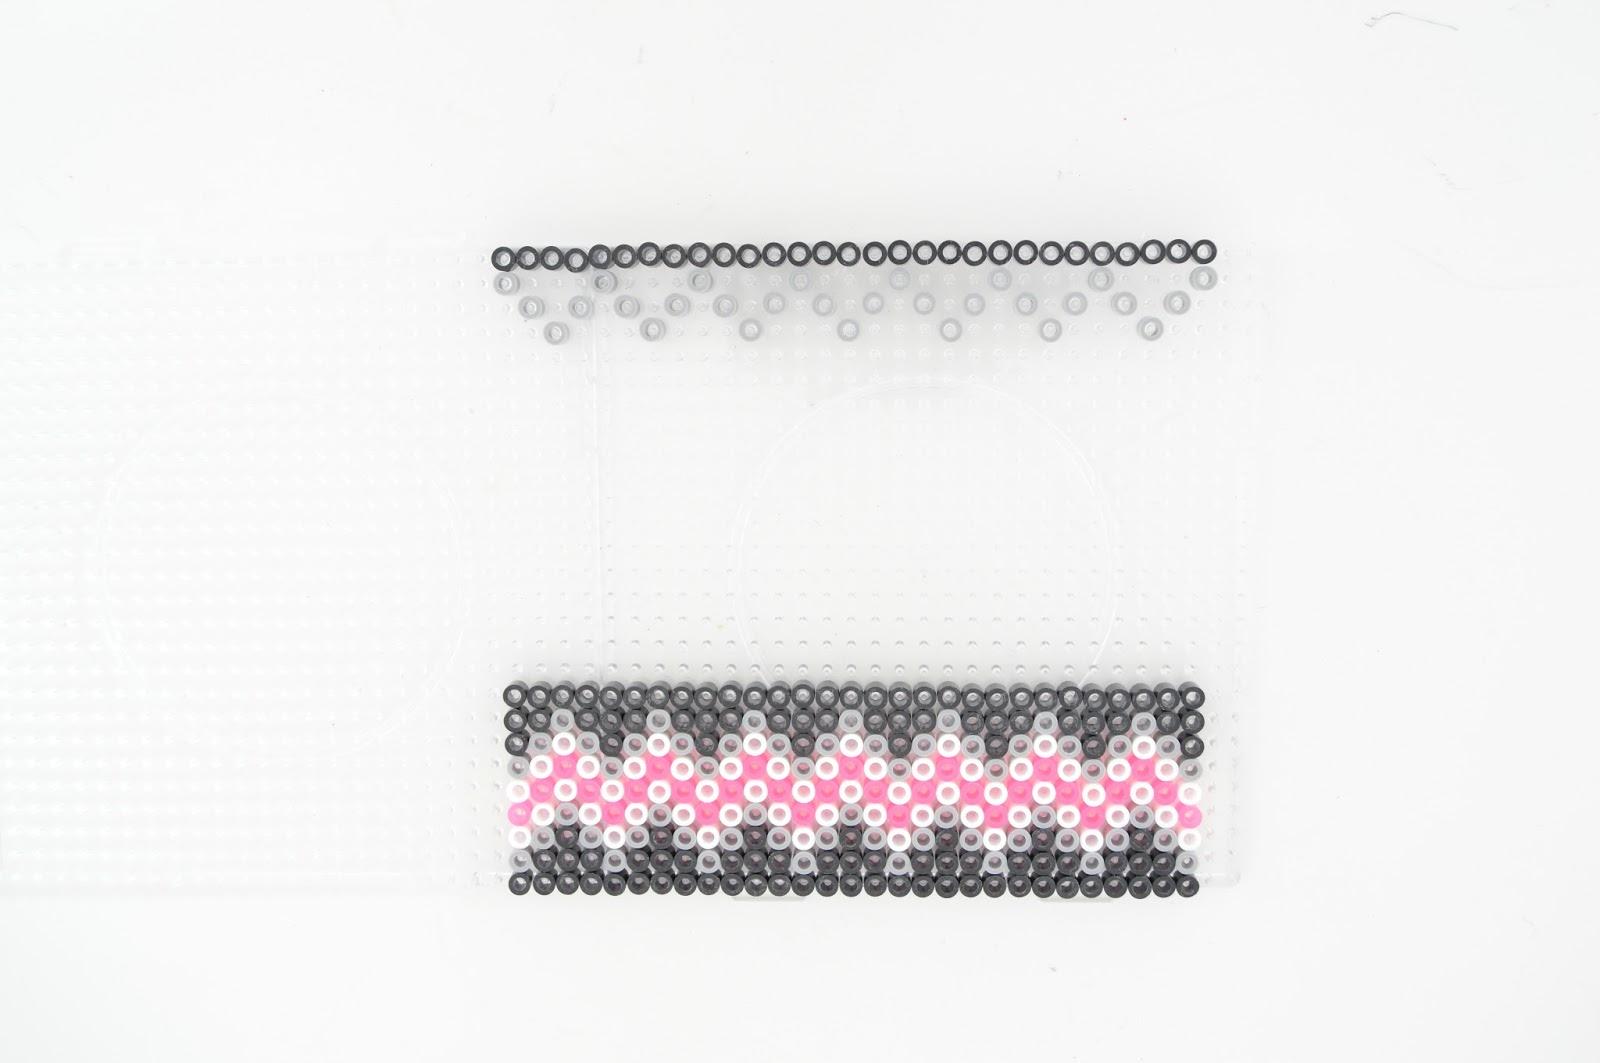 Ключница из perler beads-начало работы над верхним узором